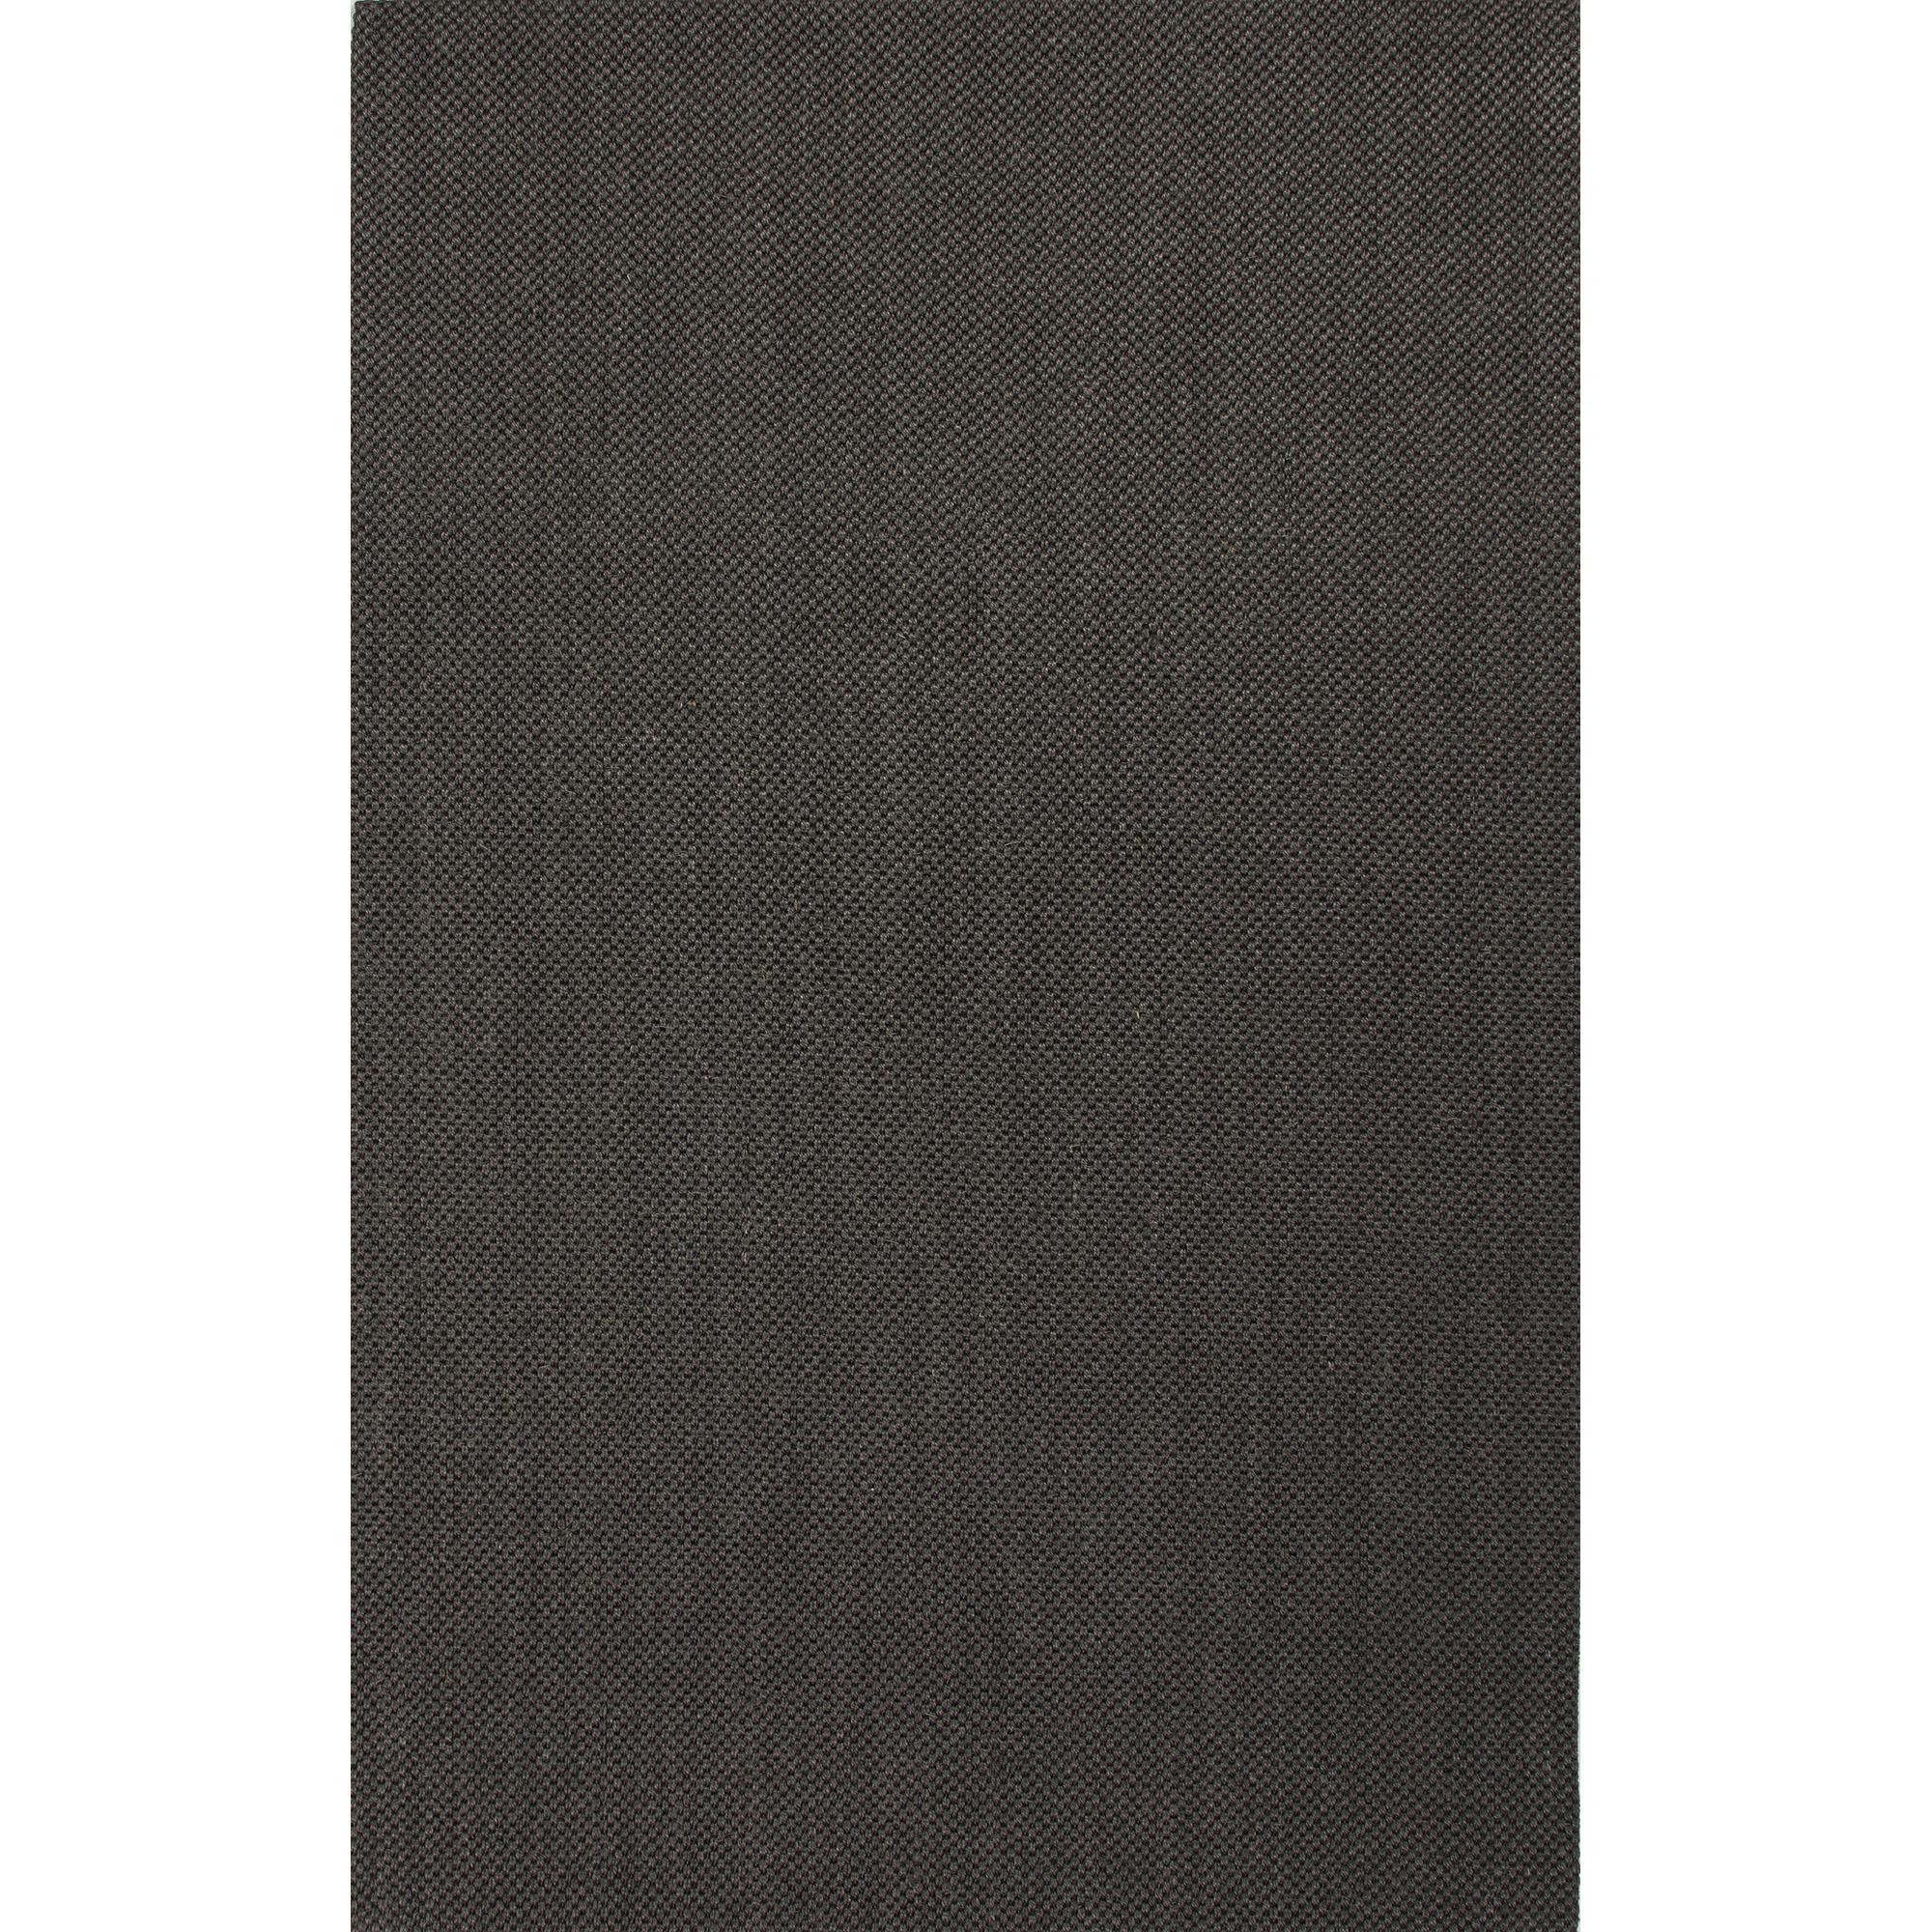 JAIPUR Rugs Naturals Sanibel 3 x 5 Rug - Item Number: RUG119168